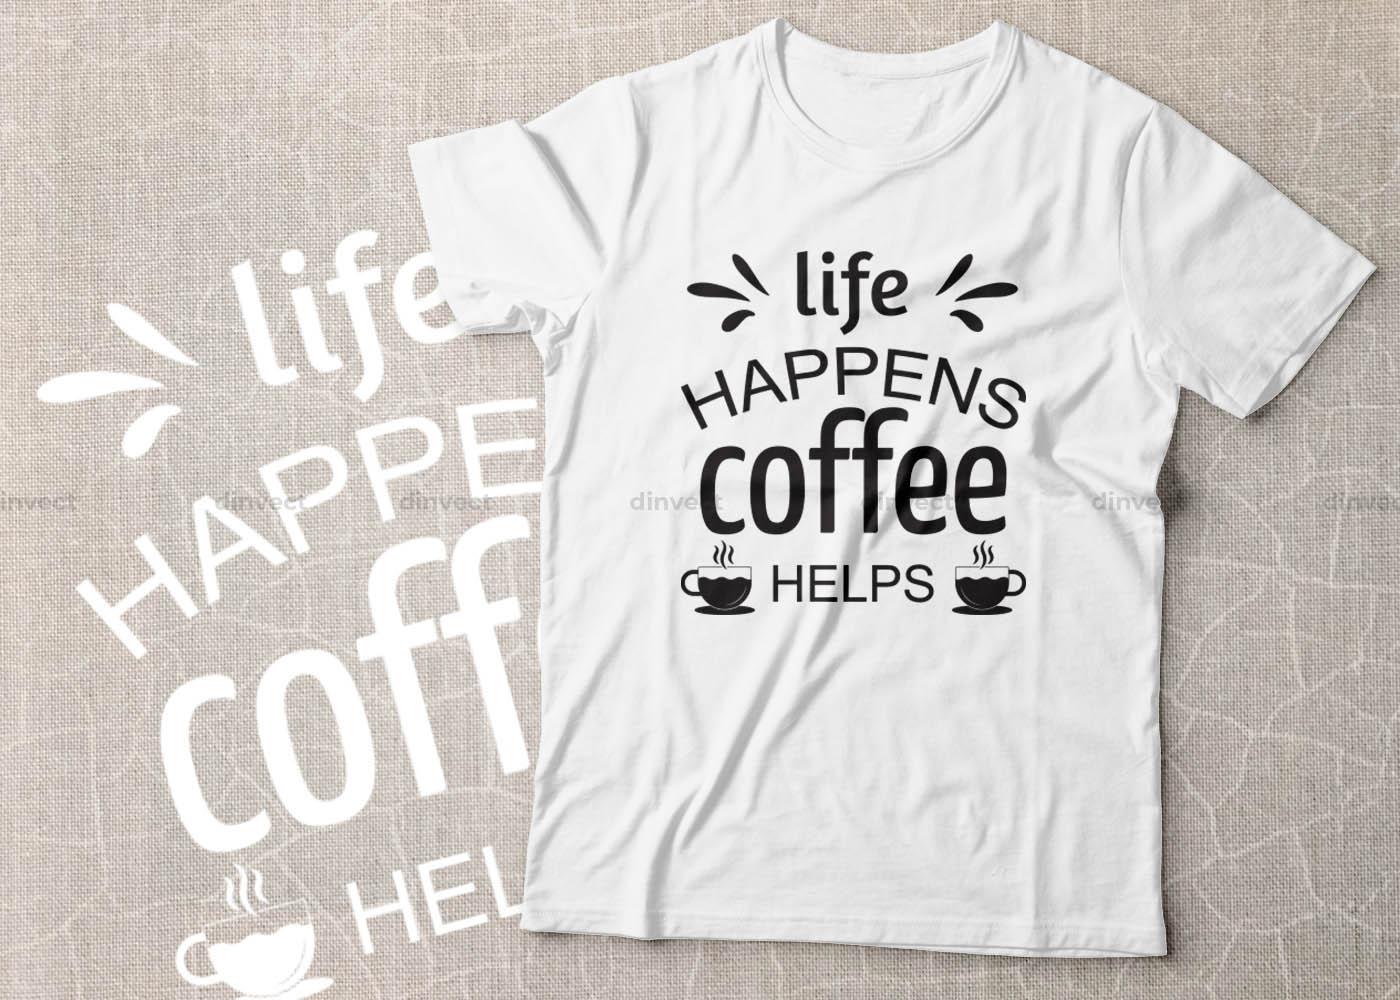 Coffee SVG, Coffee Bundle Svg, Coffee Mug Svg, Funny Coffee Quotes SVG, Mug Design Svg, Coffee Quote - Coffee 8 -